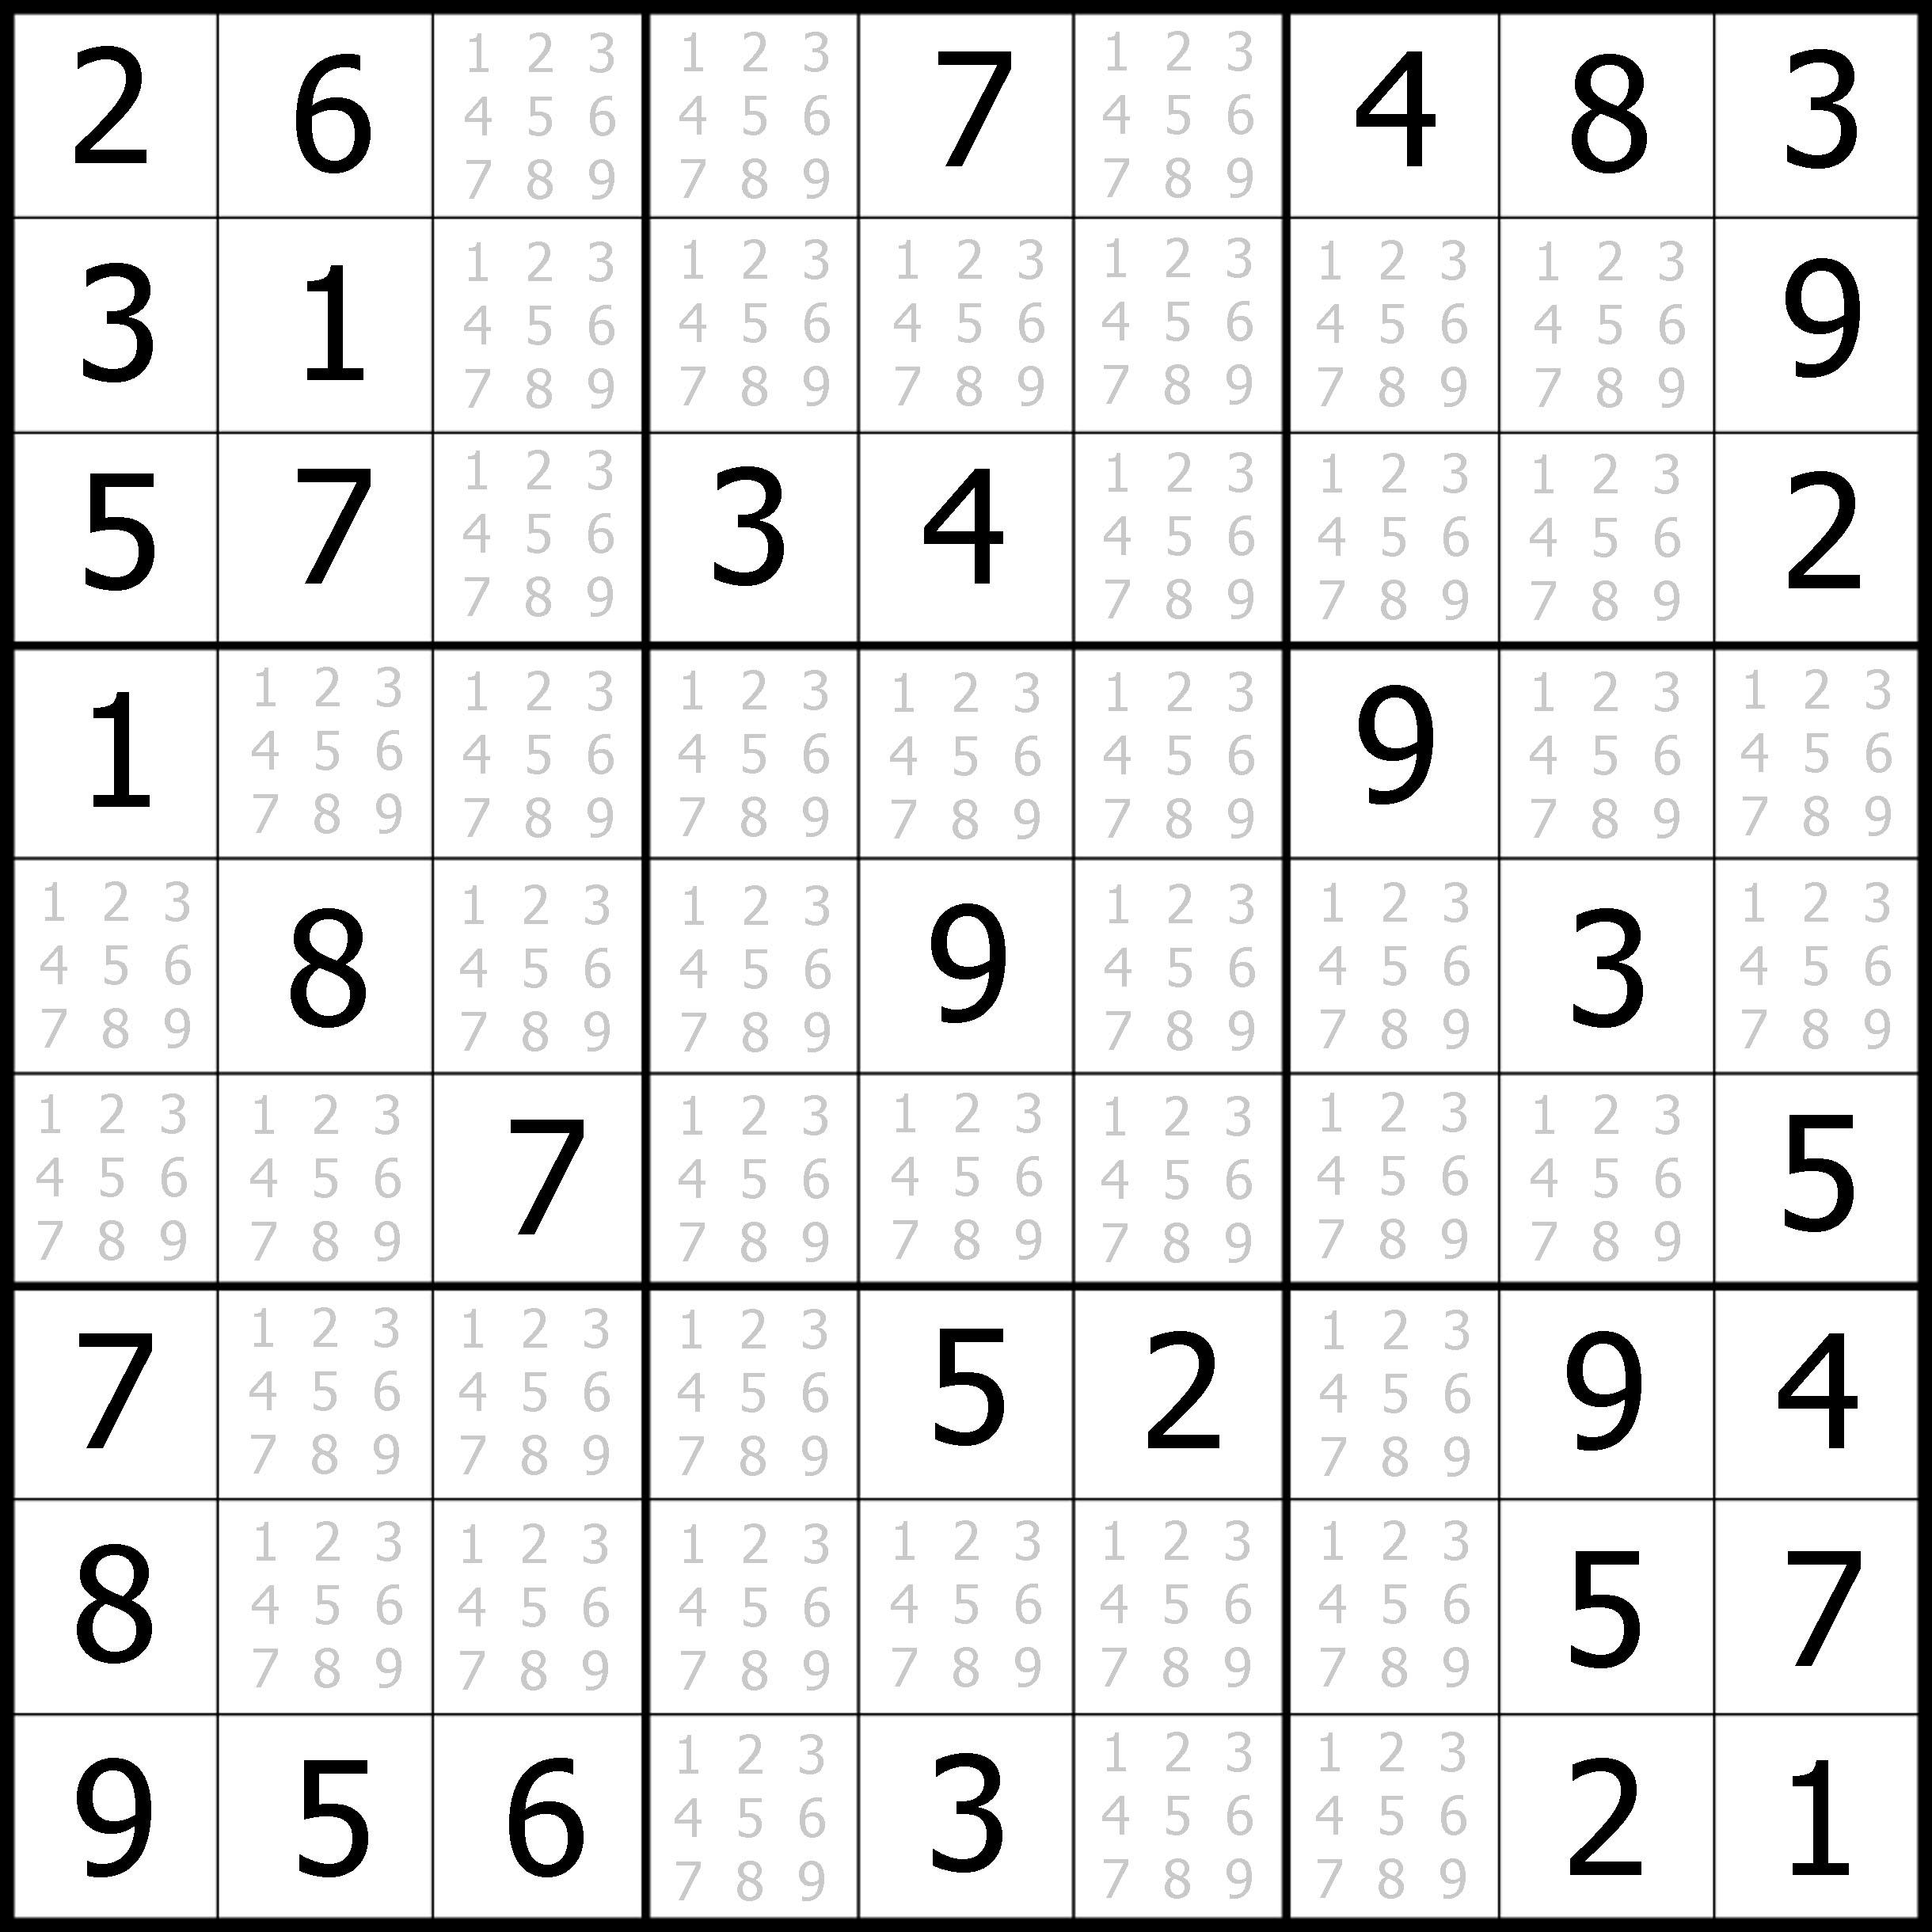 Sudoku Puzzler | Free, Printable, Updated Sudoku Puzzles With A - Printable Puzzle Sudoku